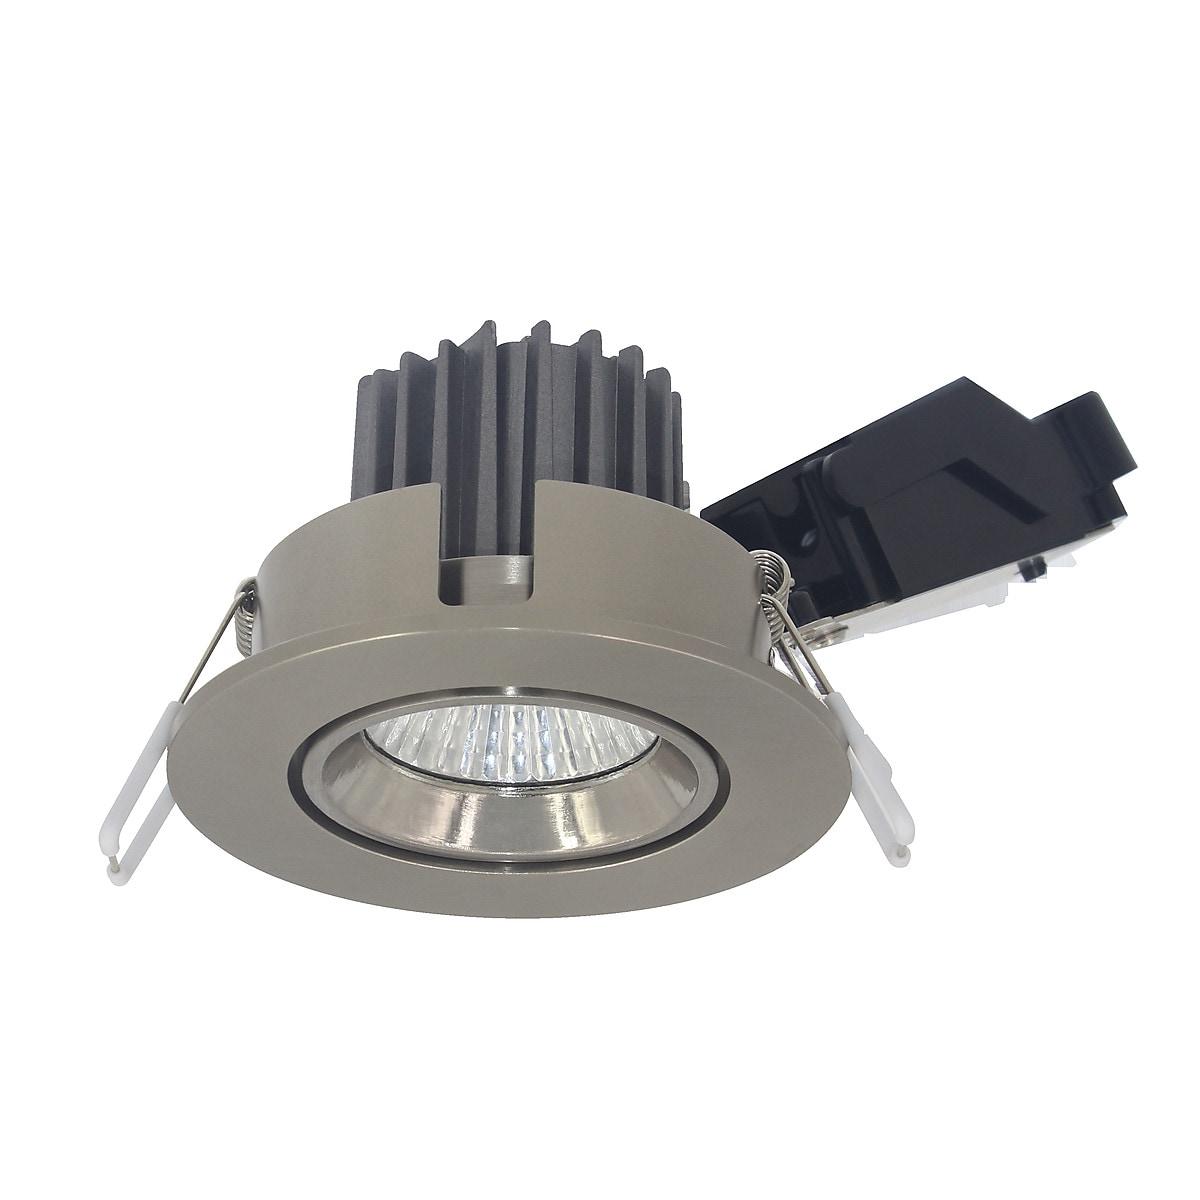 230 V Dimmable LED Downlight